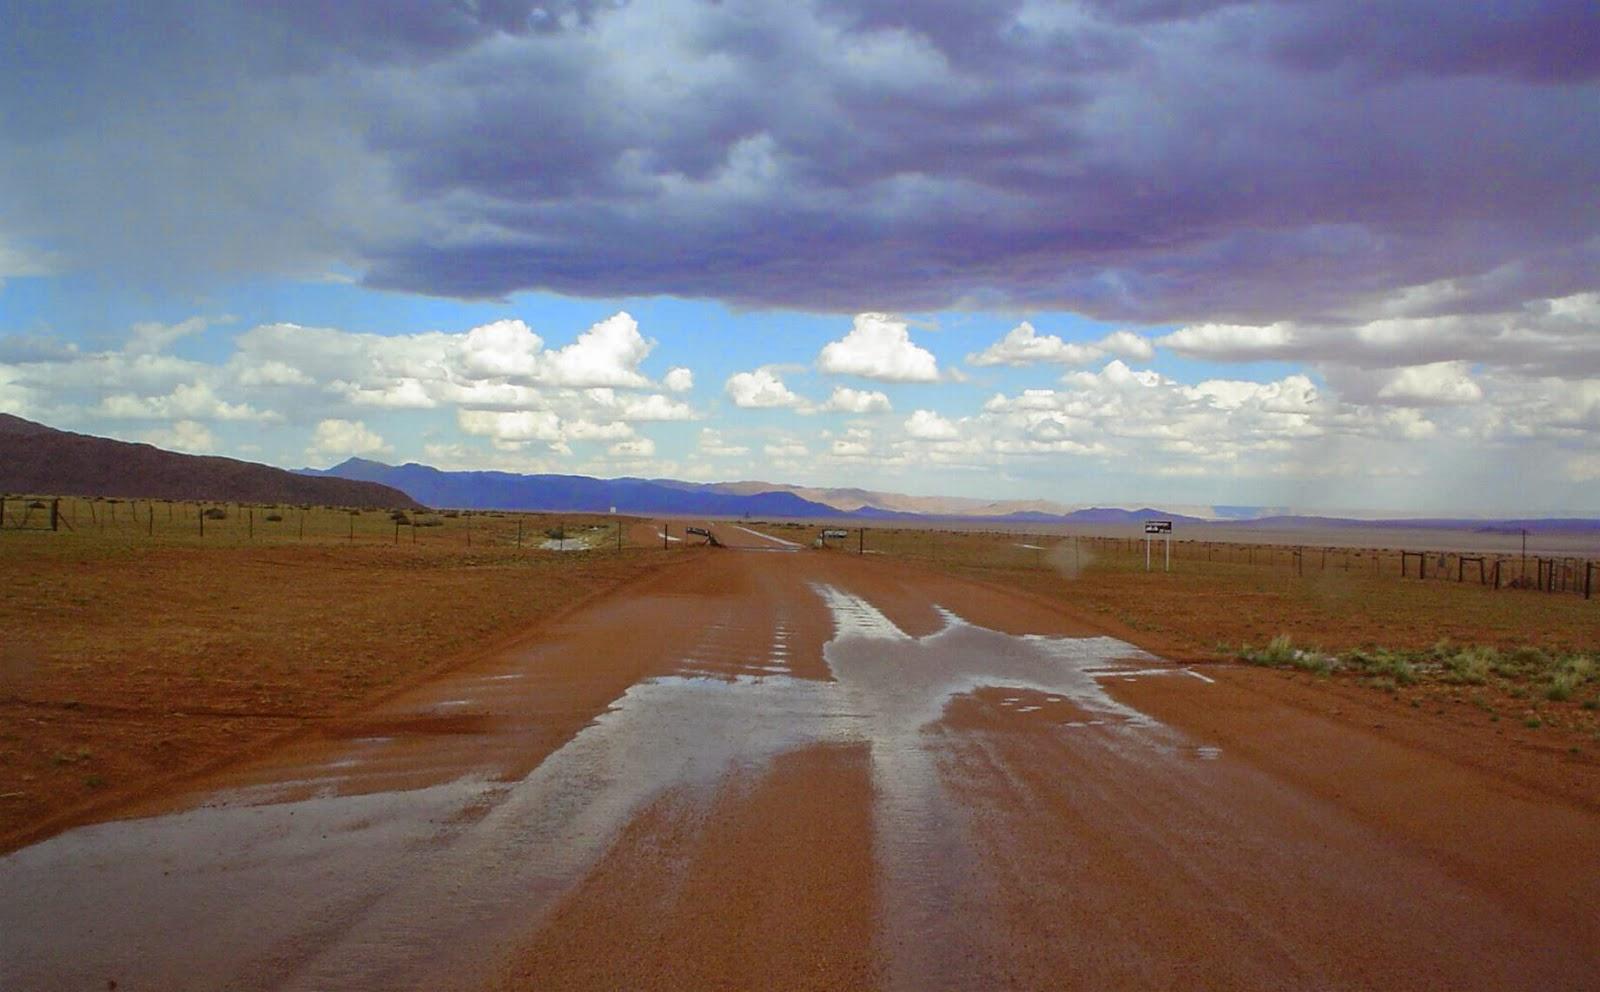 Scenic route 707 Namibia - www.namibweb.com